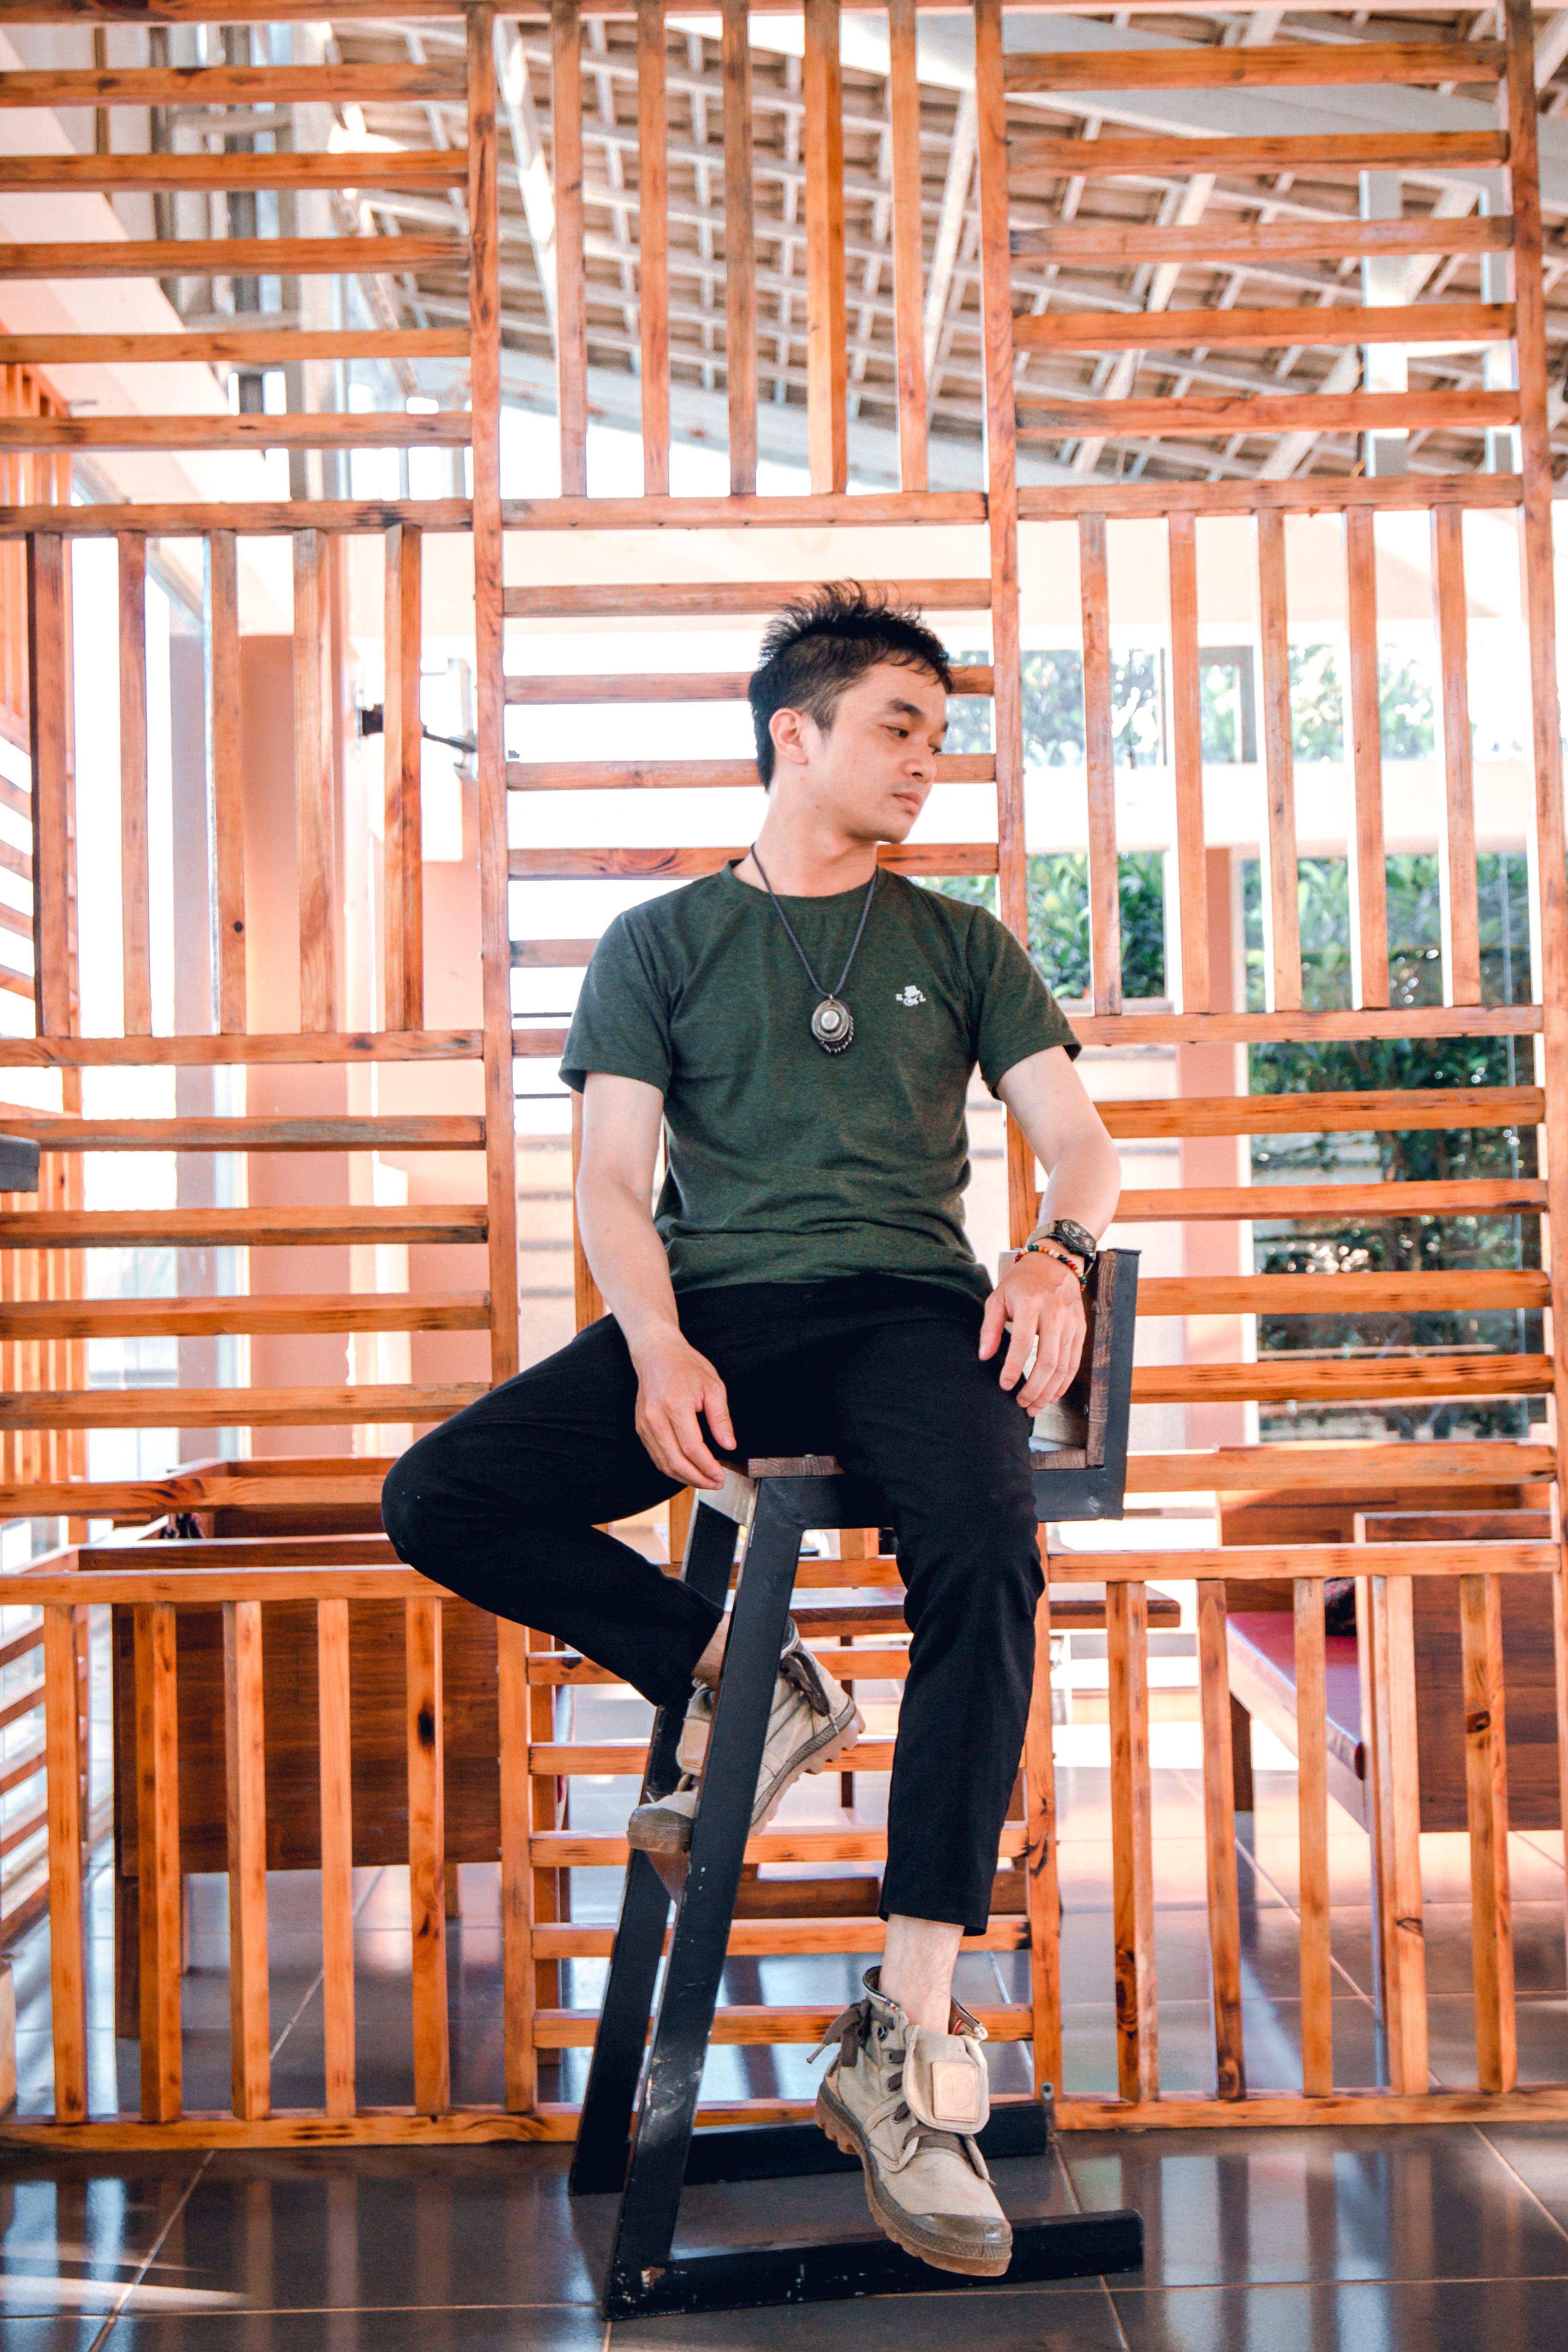 Man in Green Crew-neck Shirt Sitting on Black Wooden Chair